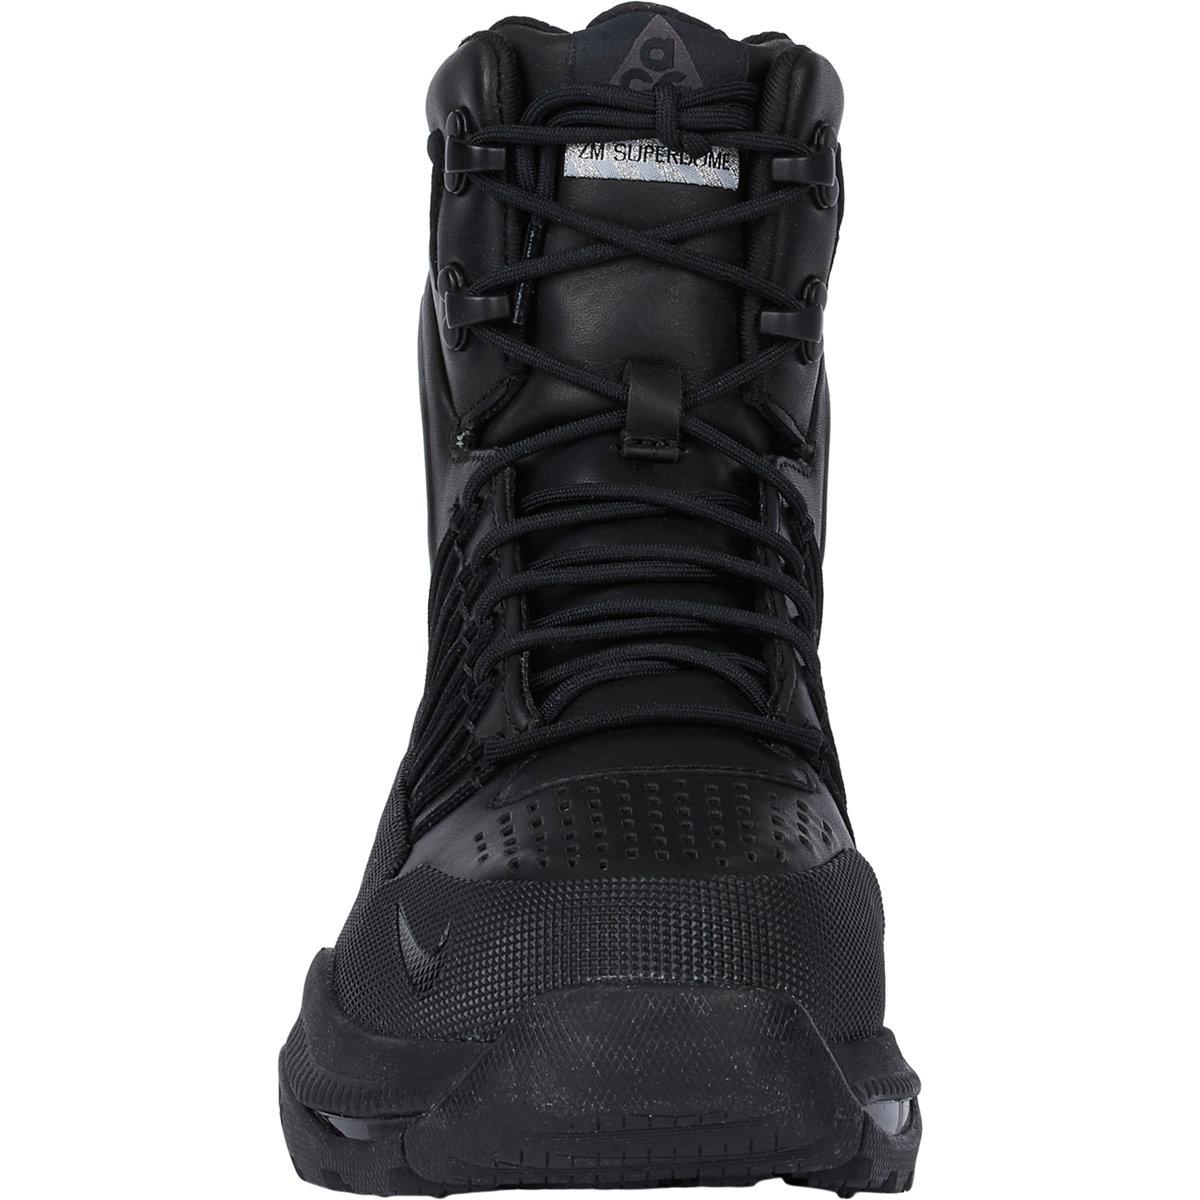 buy popular 4265d da609 Nike Zoom Superdome Boots in Black for Men - Lyst